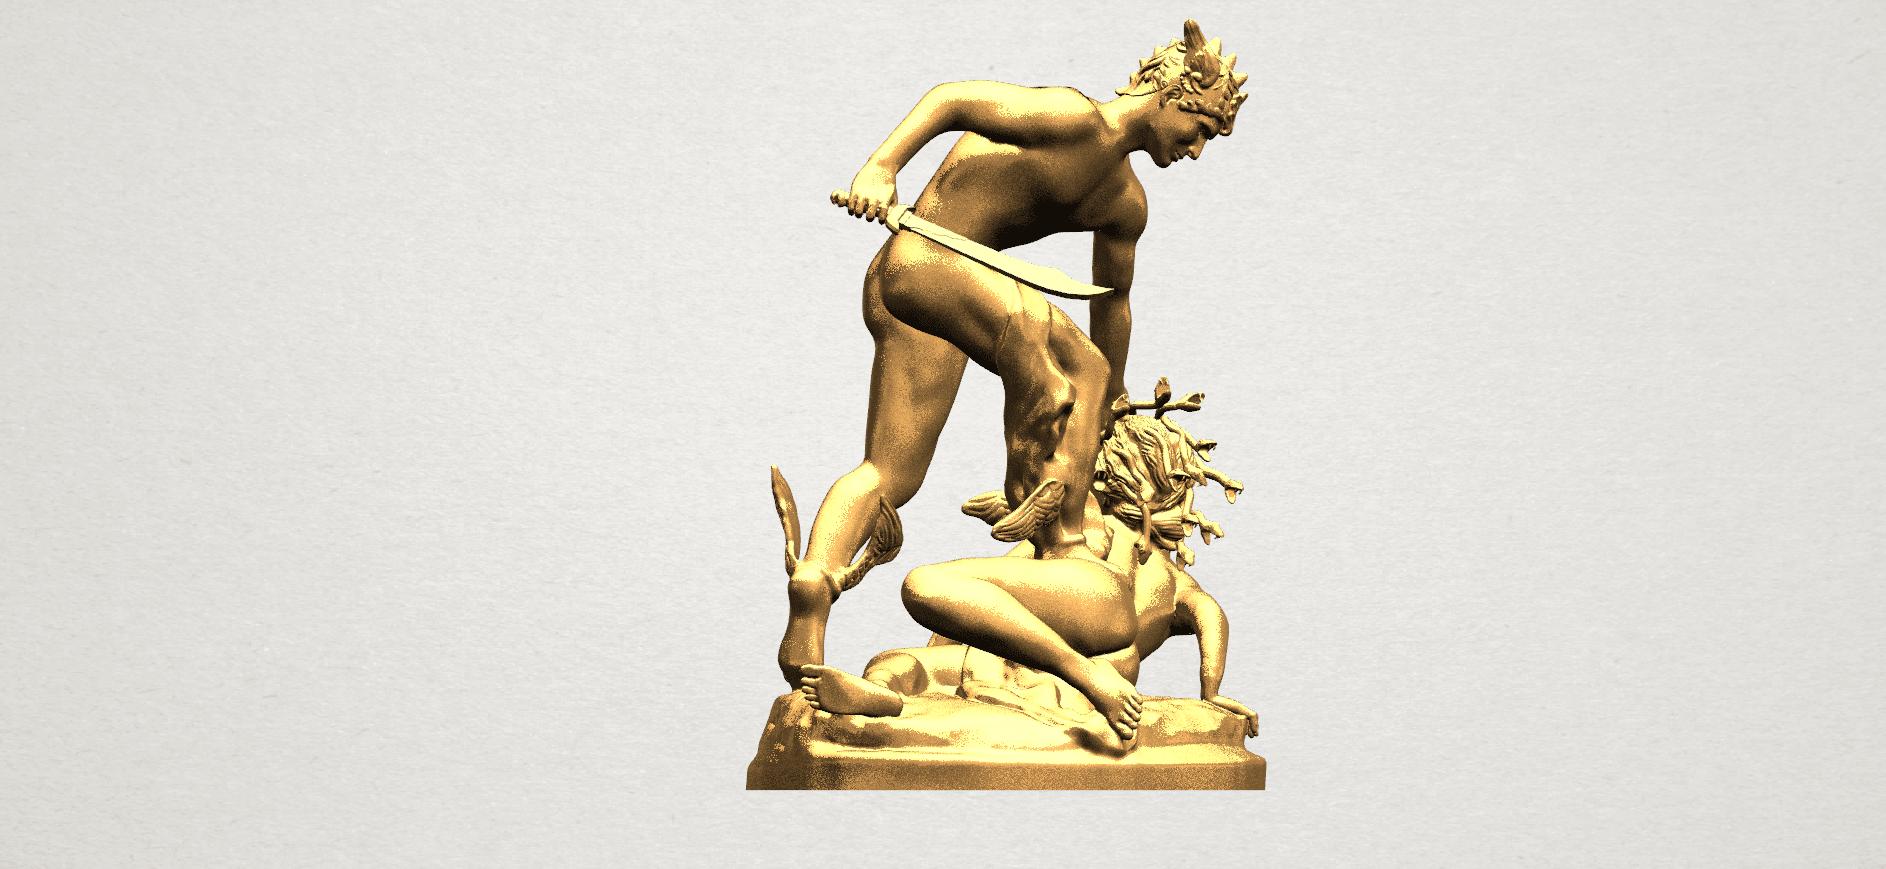 Killing - A05.png Download free STL file Killing 01 • 3D printable model, GeorgesNikkei